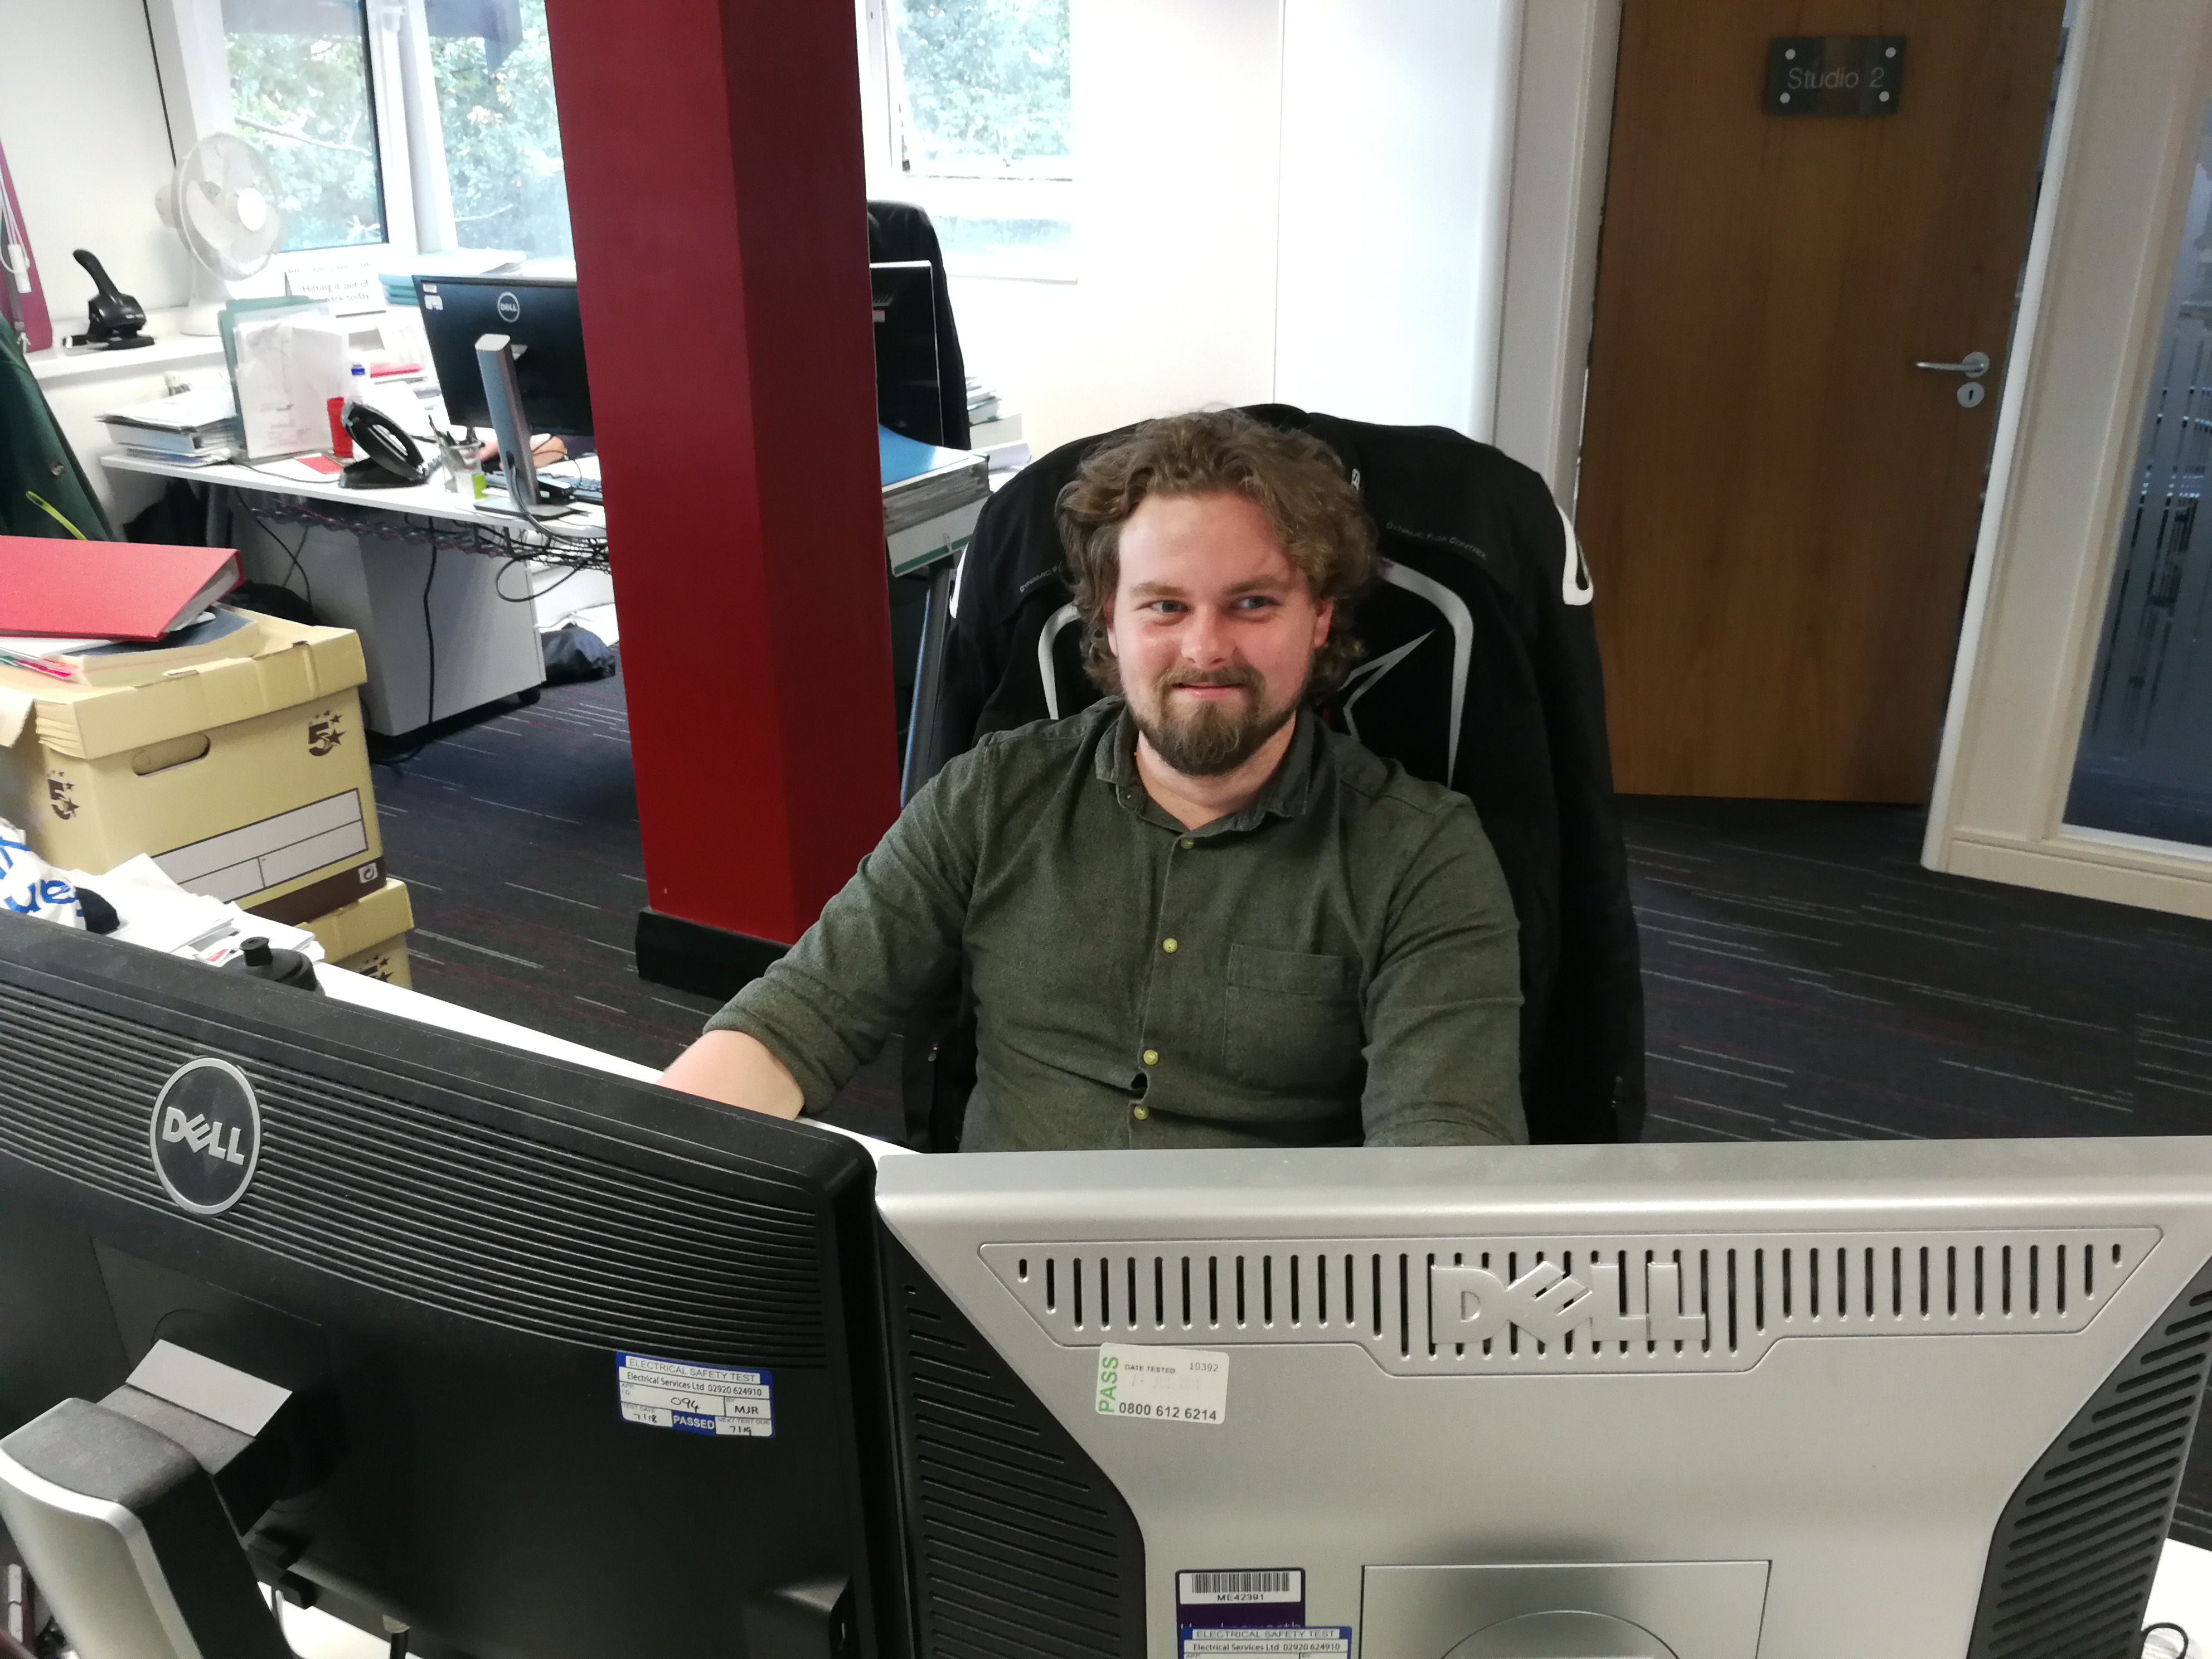 Civil engineer Joel Wall sitting at his desk